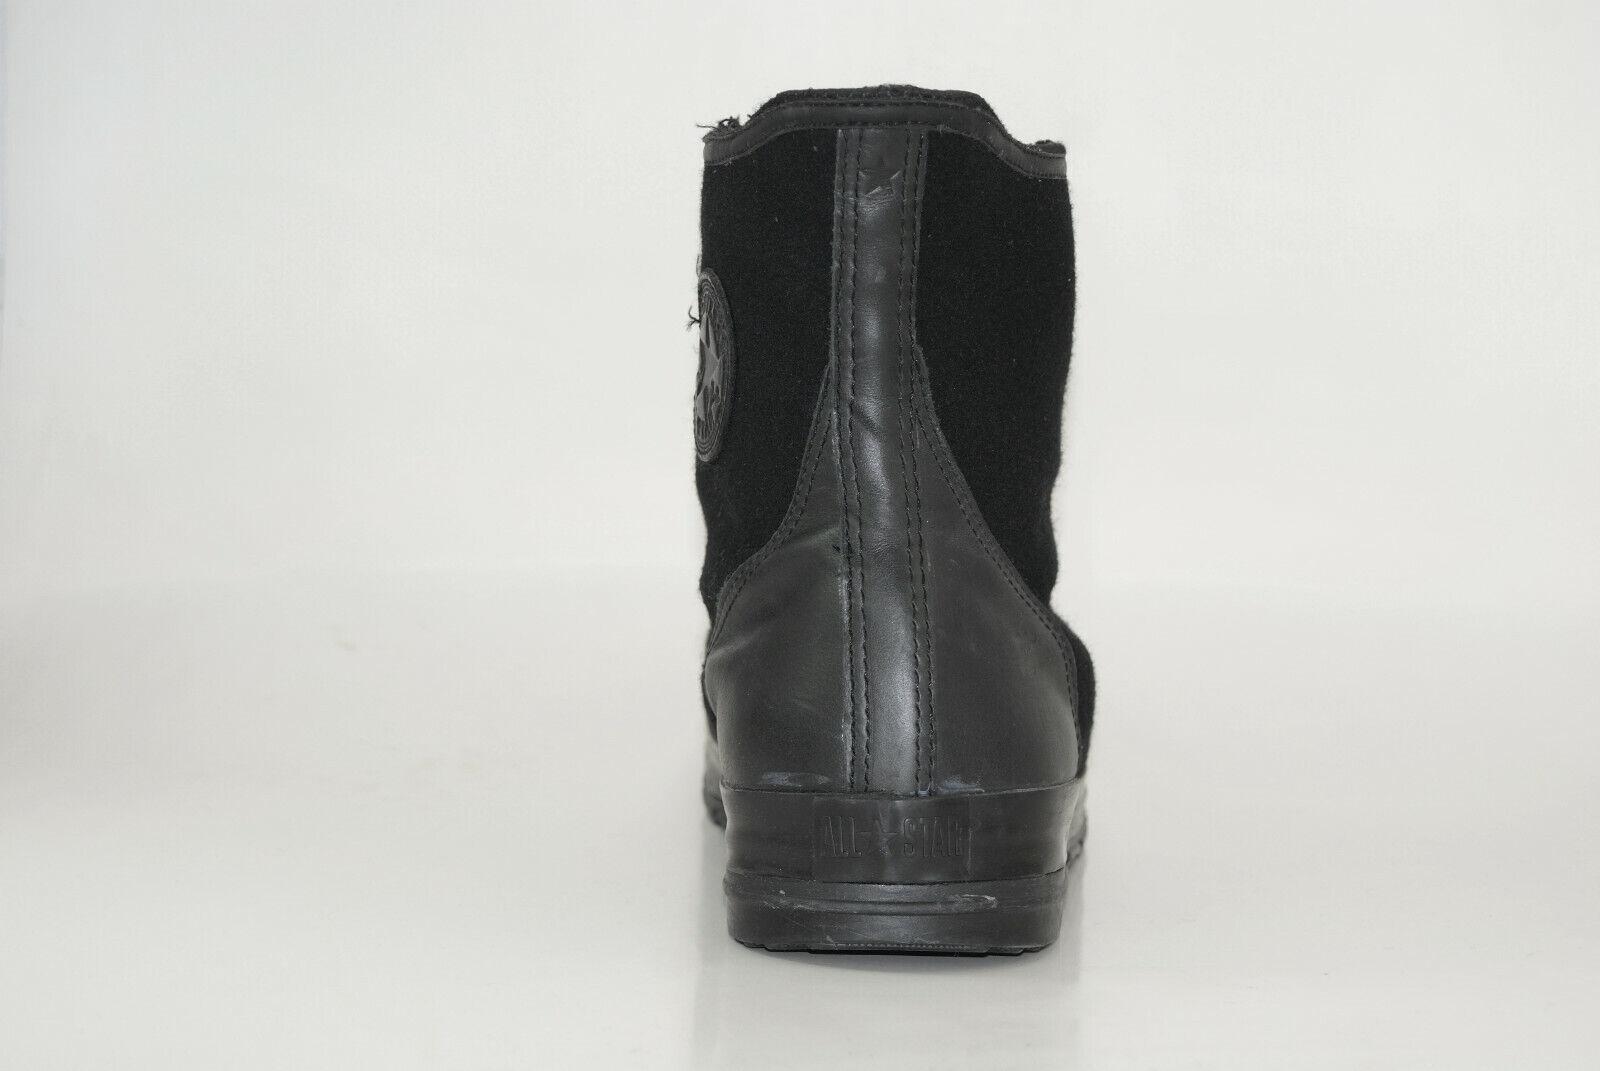 Converse Chuck Taylor All Star High Rise Rise Rise WOOLRICH Lana stivali 46 Scarpe da uomo b8b346